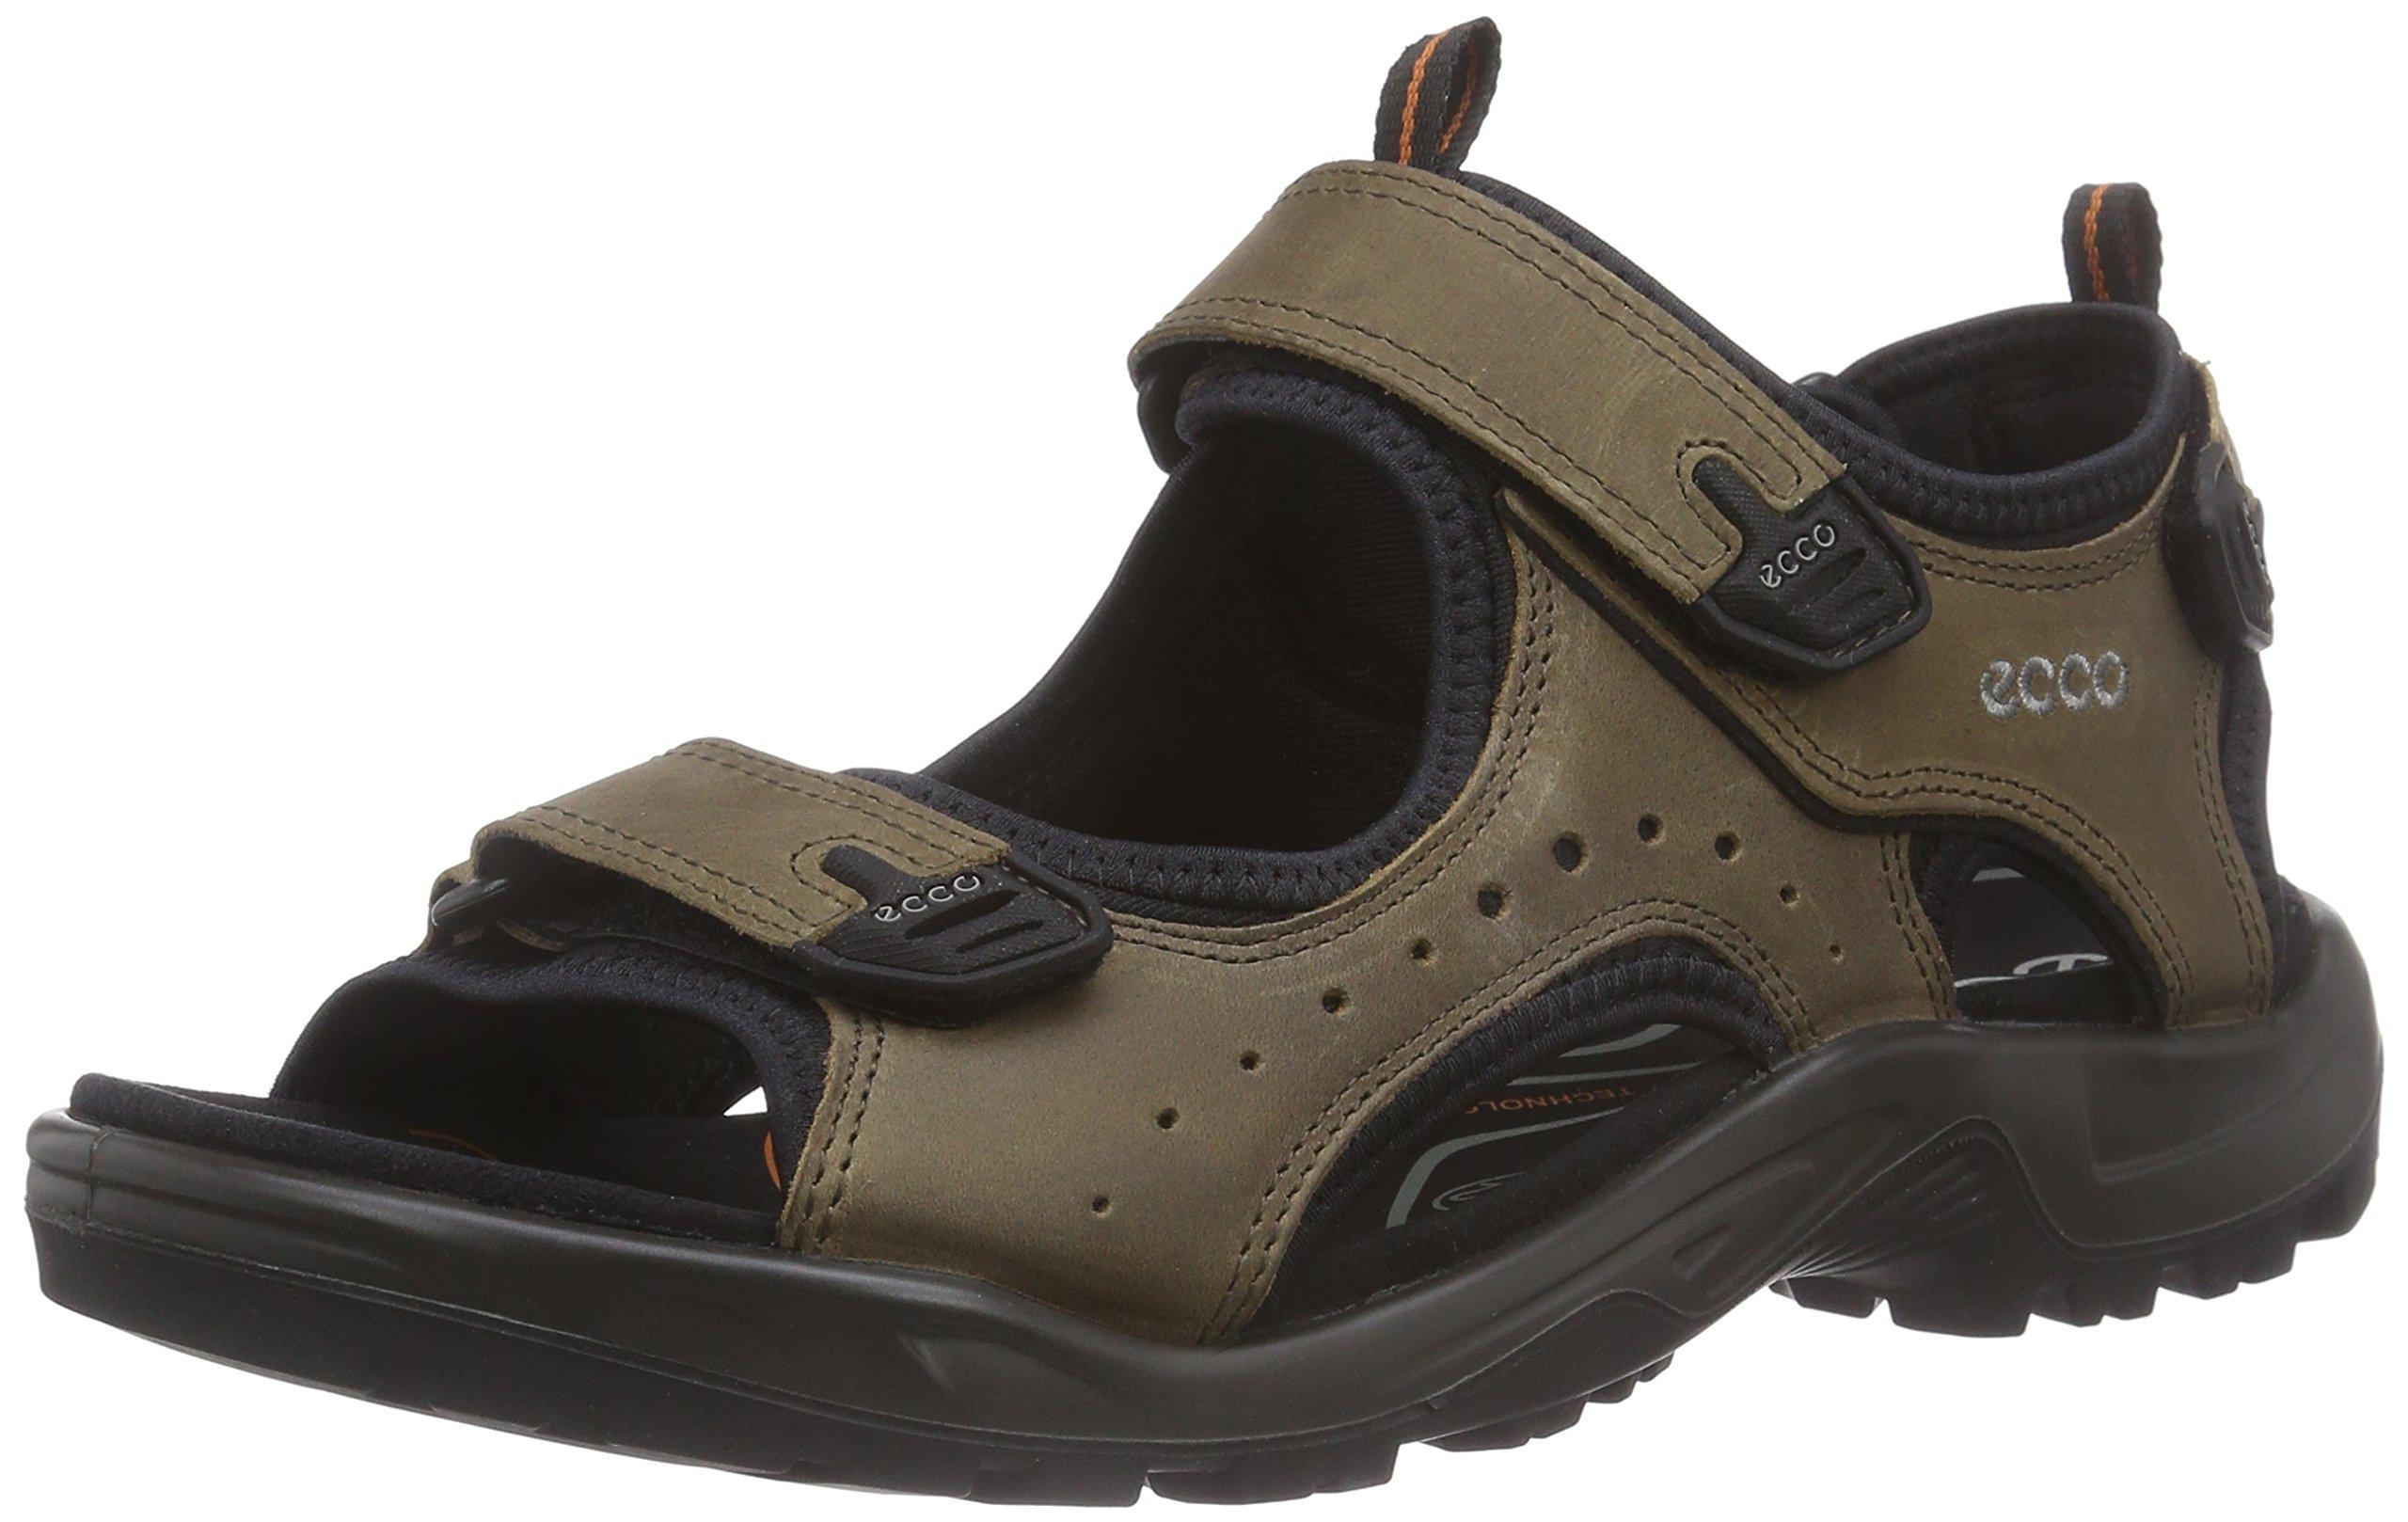 8672910bce9b7 Men's Dockyard Chukka Boot